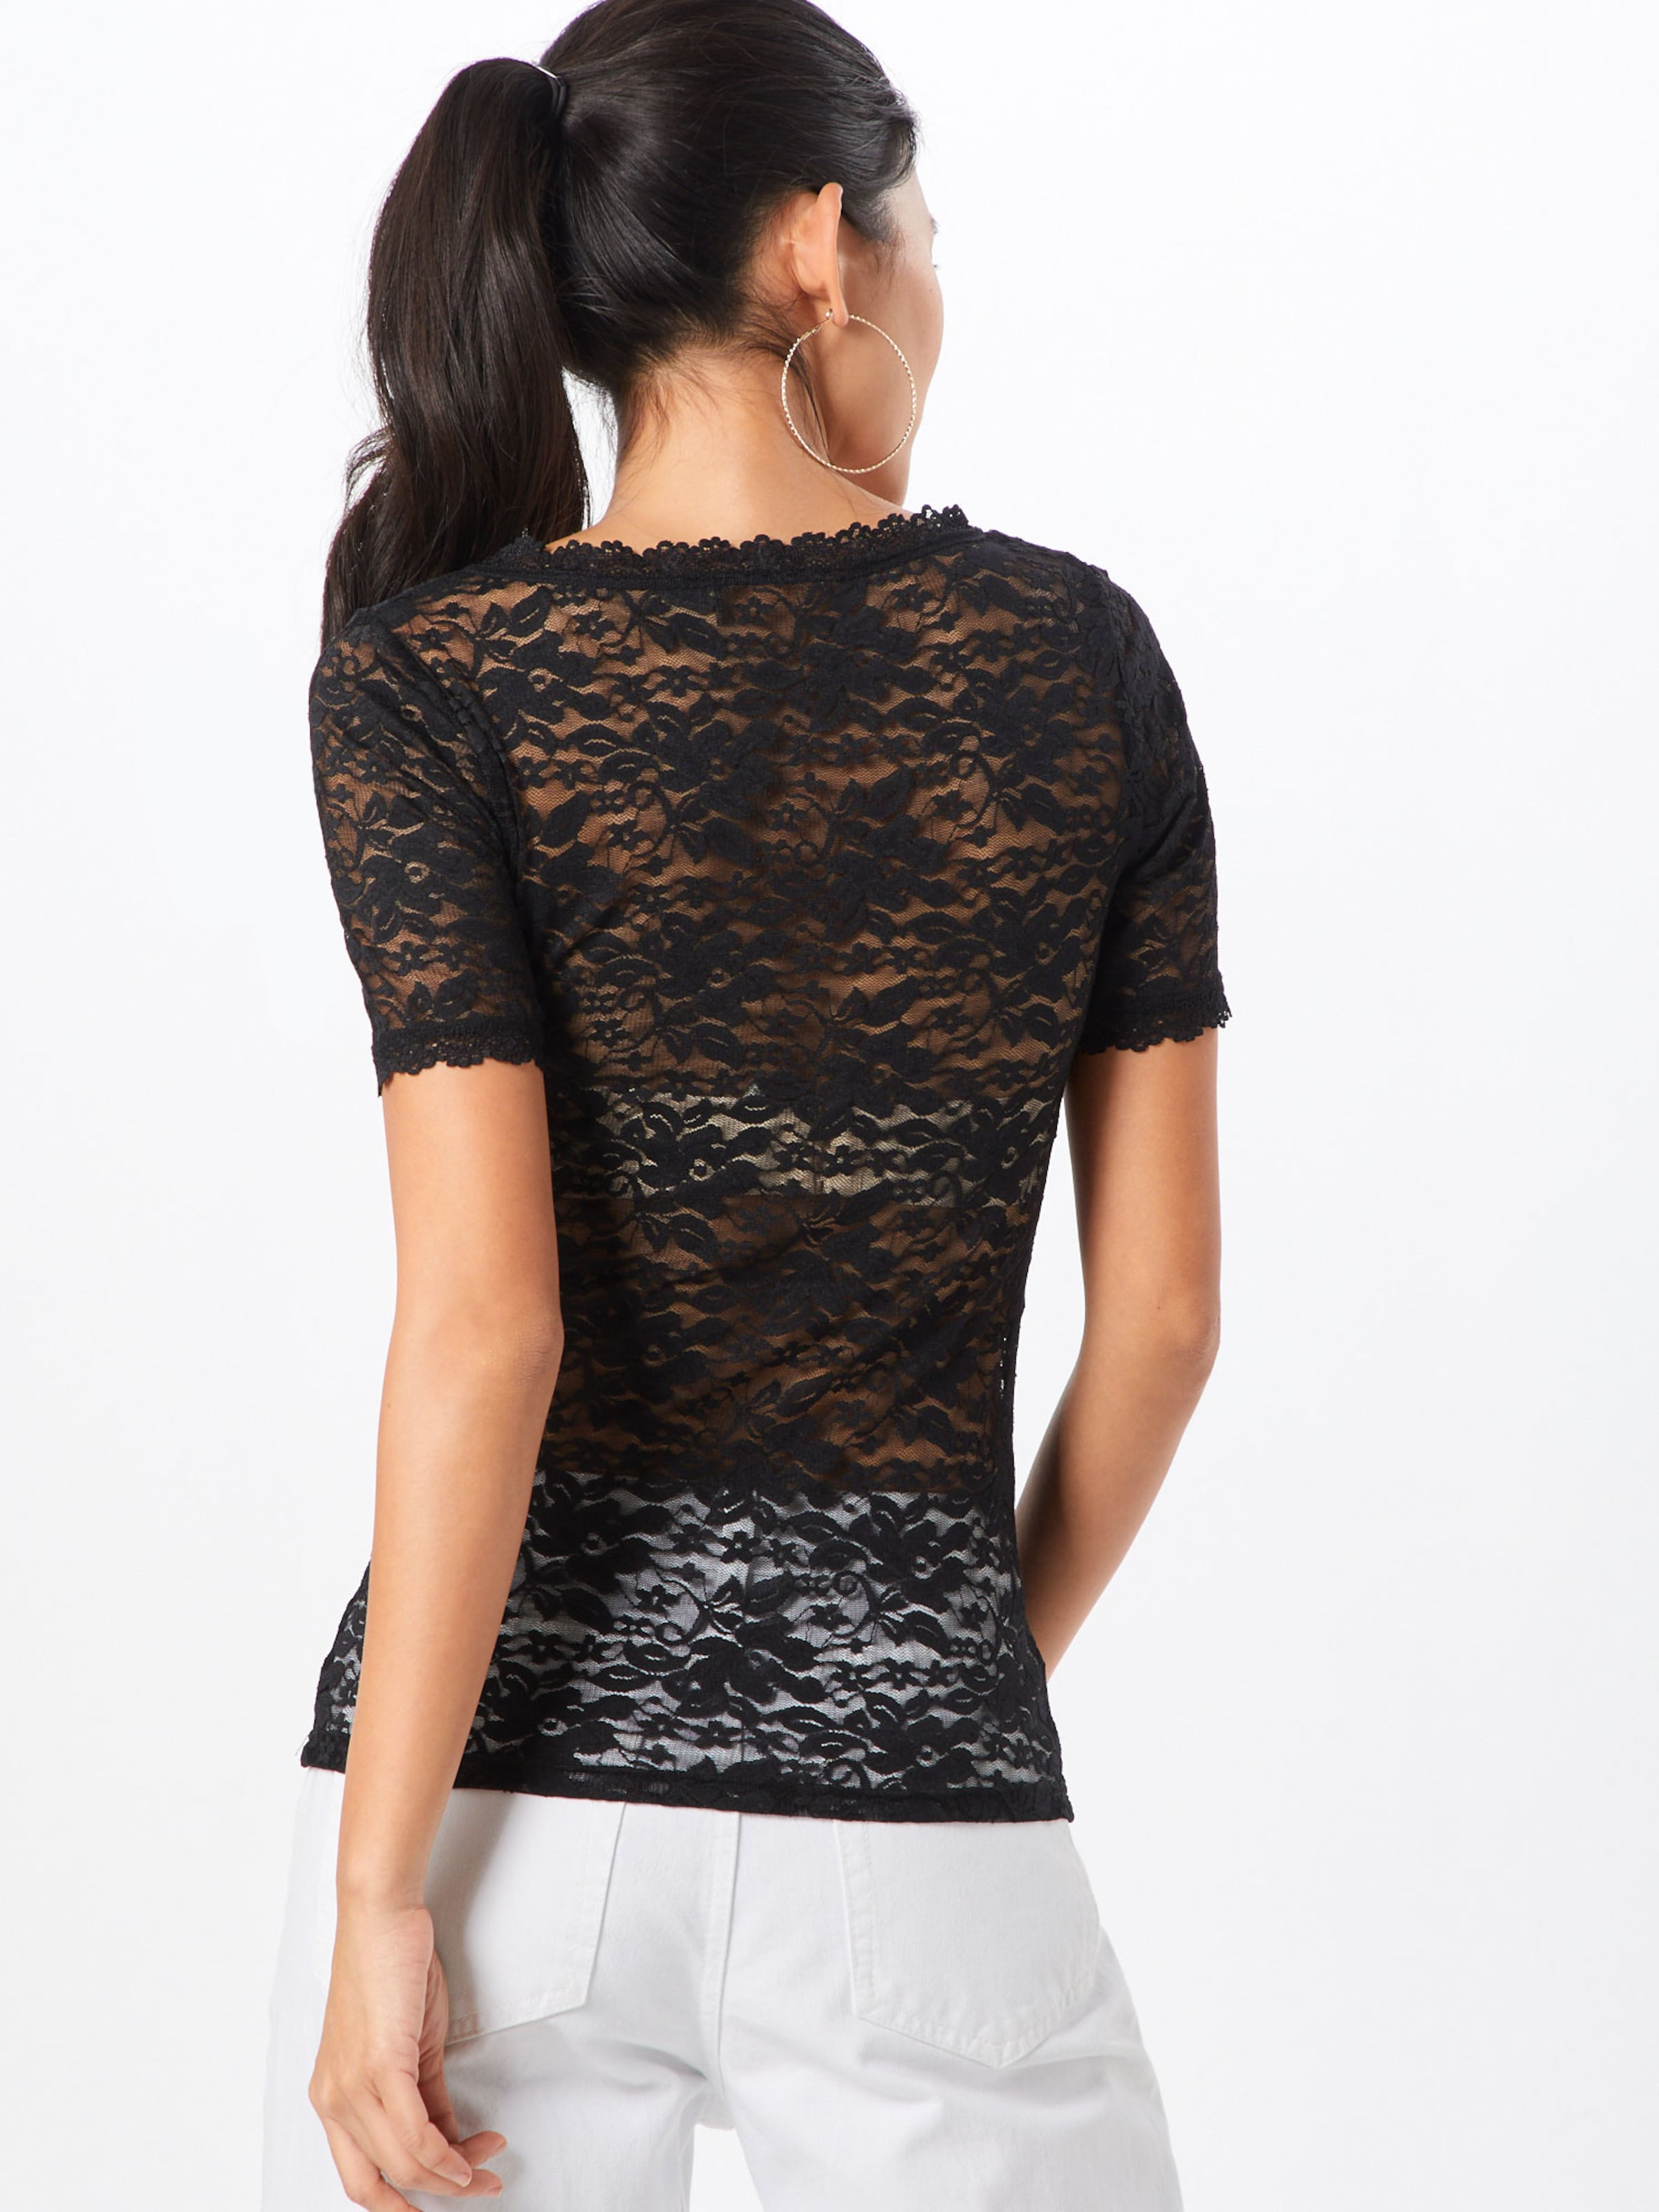 Rosemunde shirt En Noir T Noir En Rosemunde shirt shirt T Rosemunde T PikuOXZ